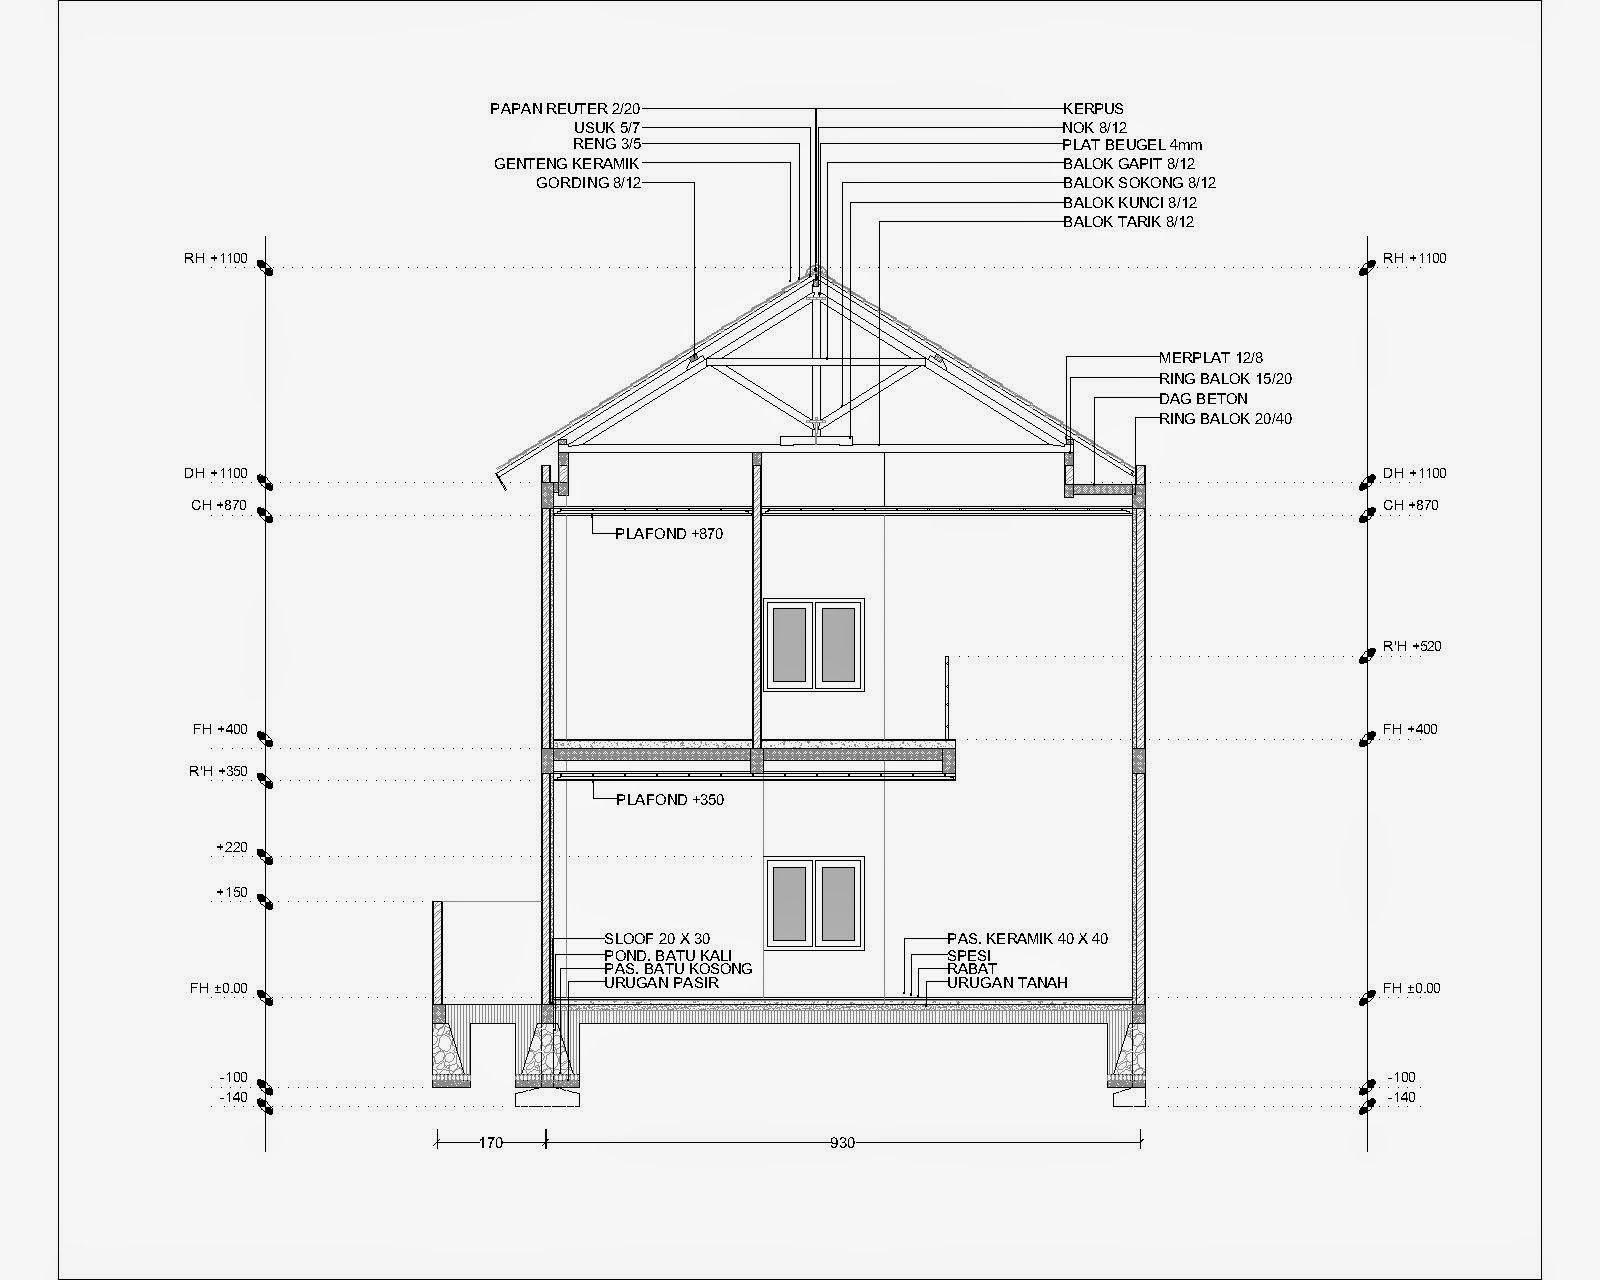 Contoh gambar potongan rumah minimalis menggunakan autocad griya contoh gambar potongan rumah minimalis menggunakan autocad griya bagus swarovskicordoba Choice Image